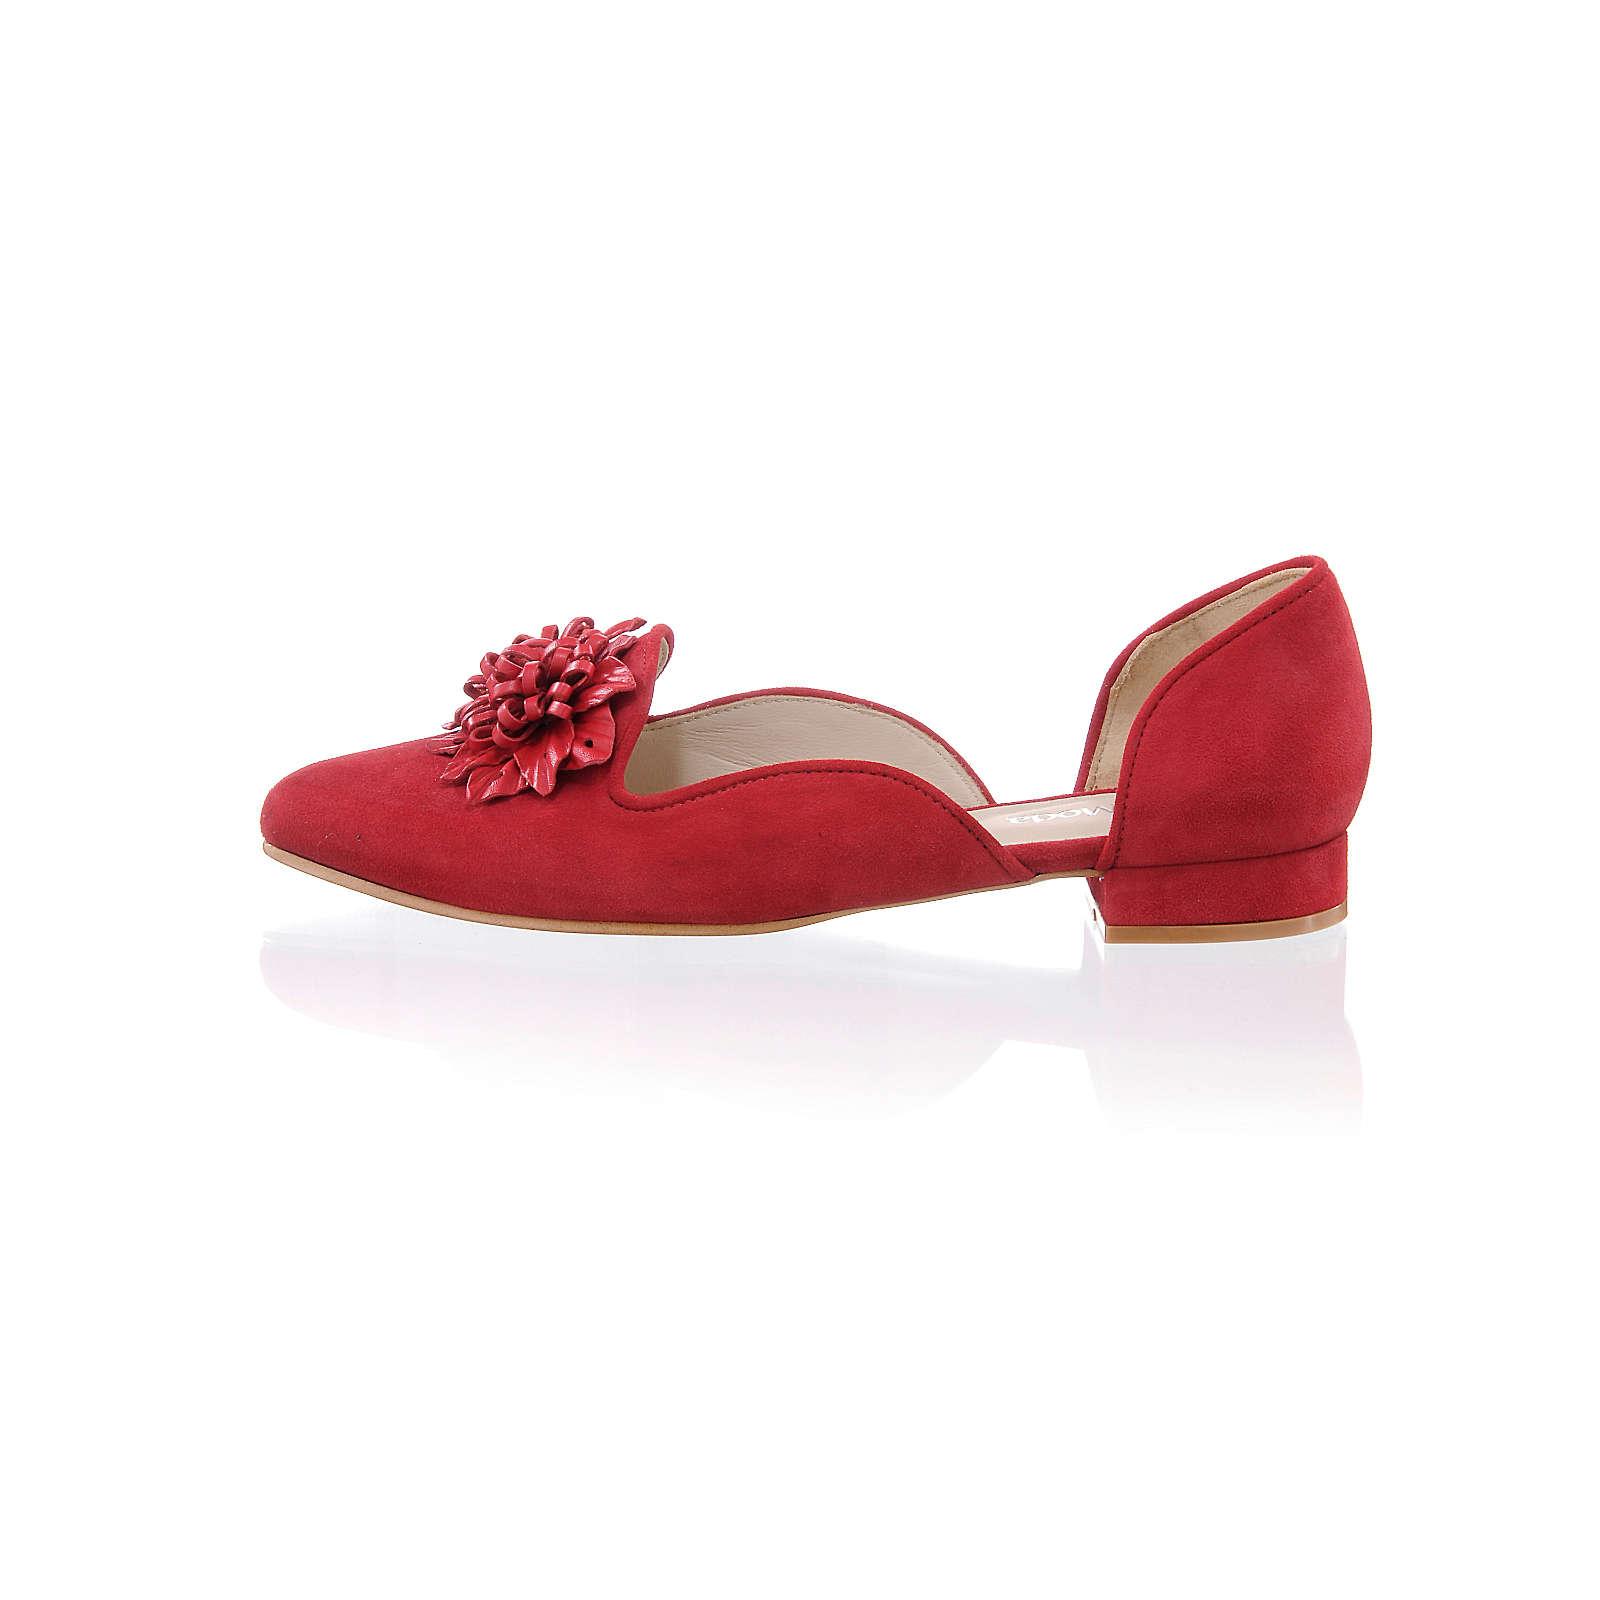 Alba Moda Ballerina rot Damen Gr. 40